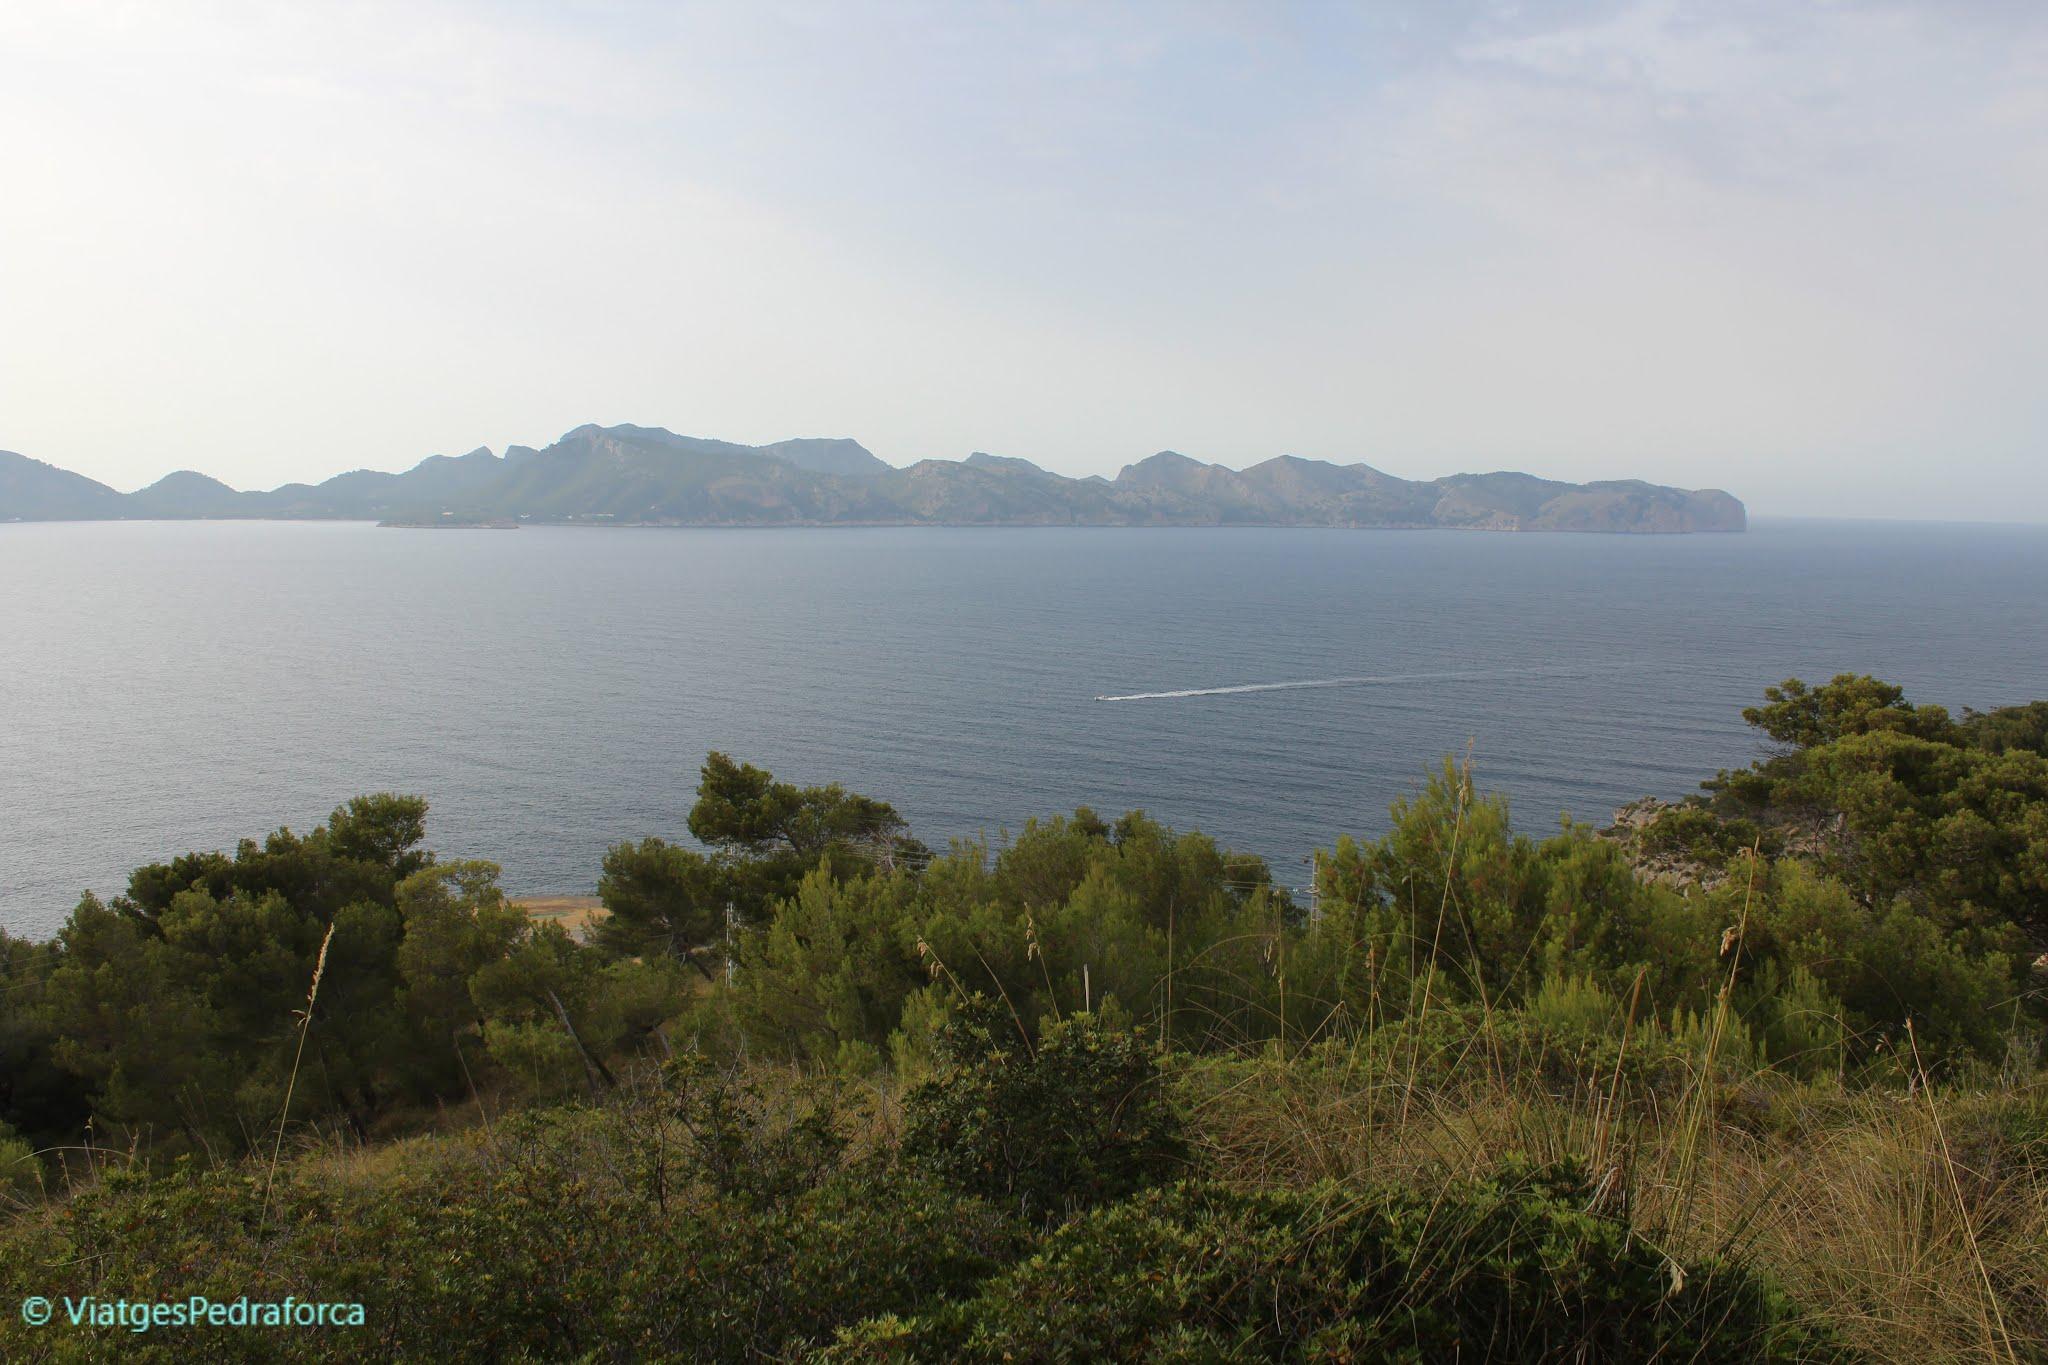 Formentor, Patrimoni de la Humanitat, Mallorca, Illes Balears, Països Catalans